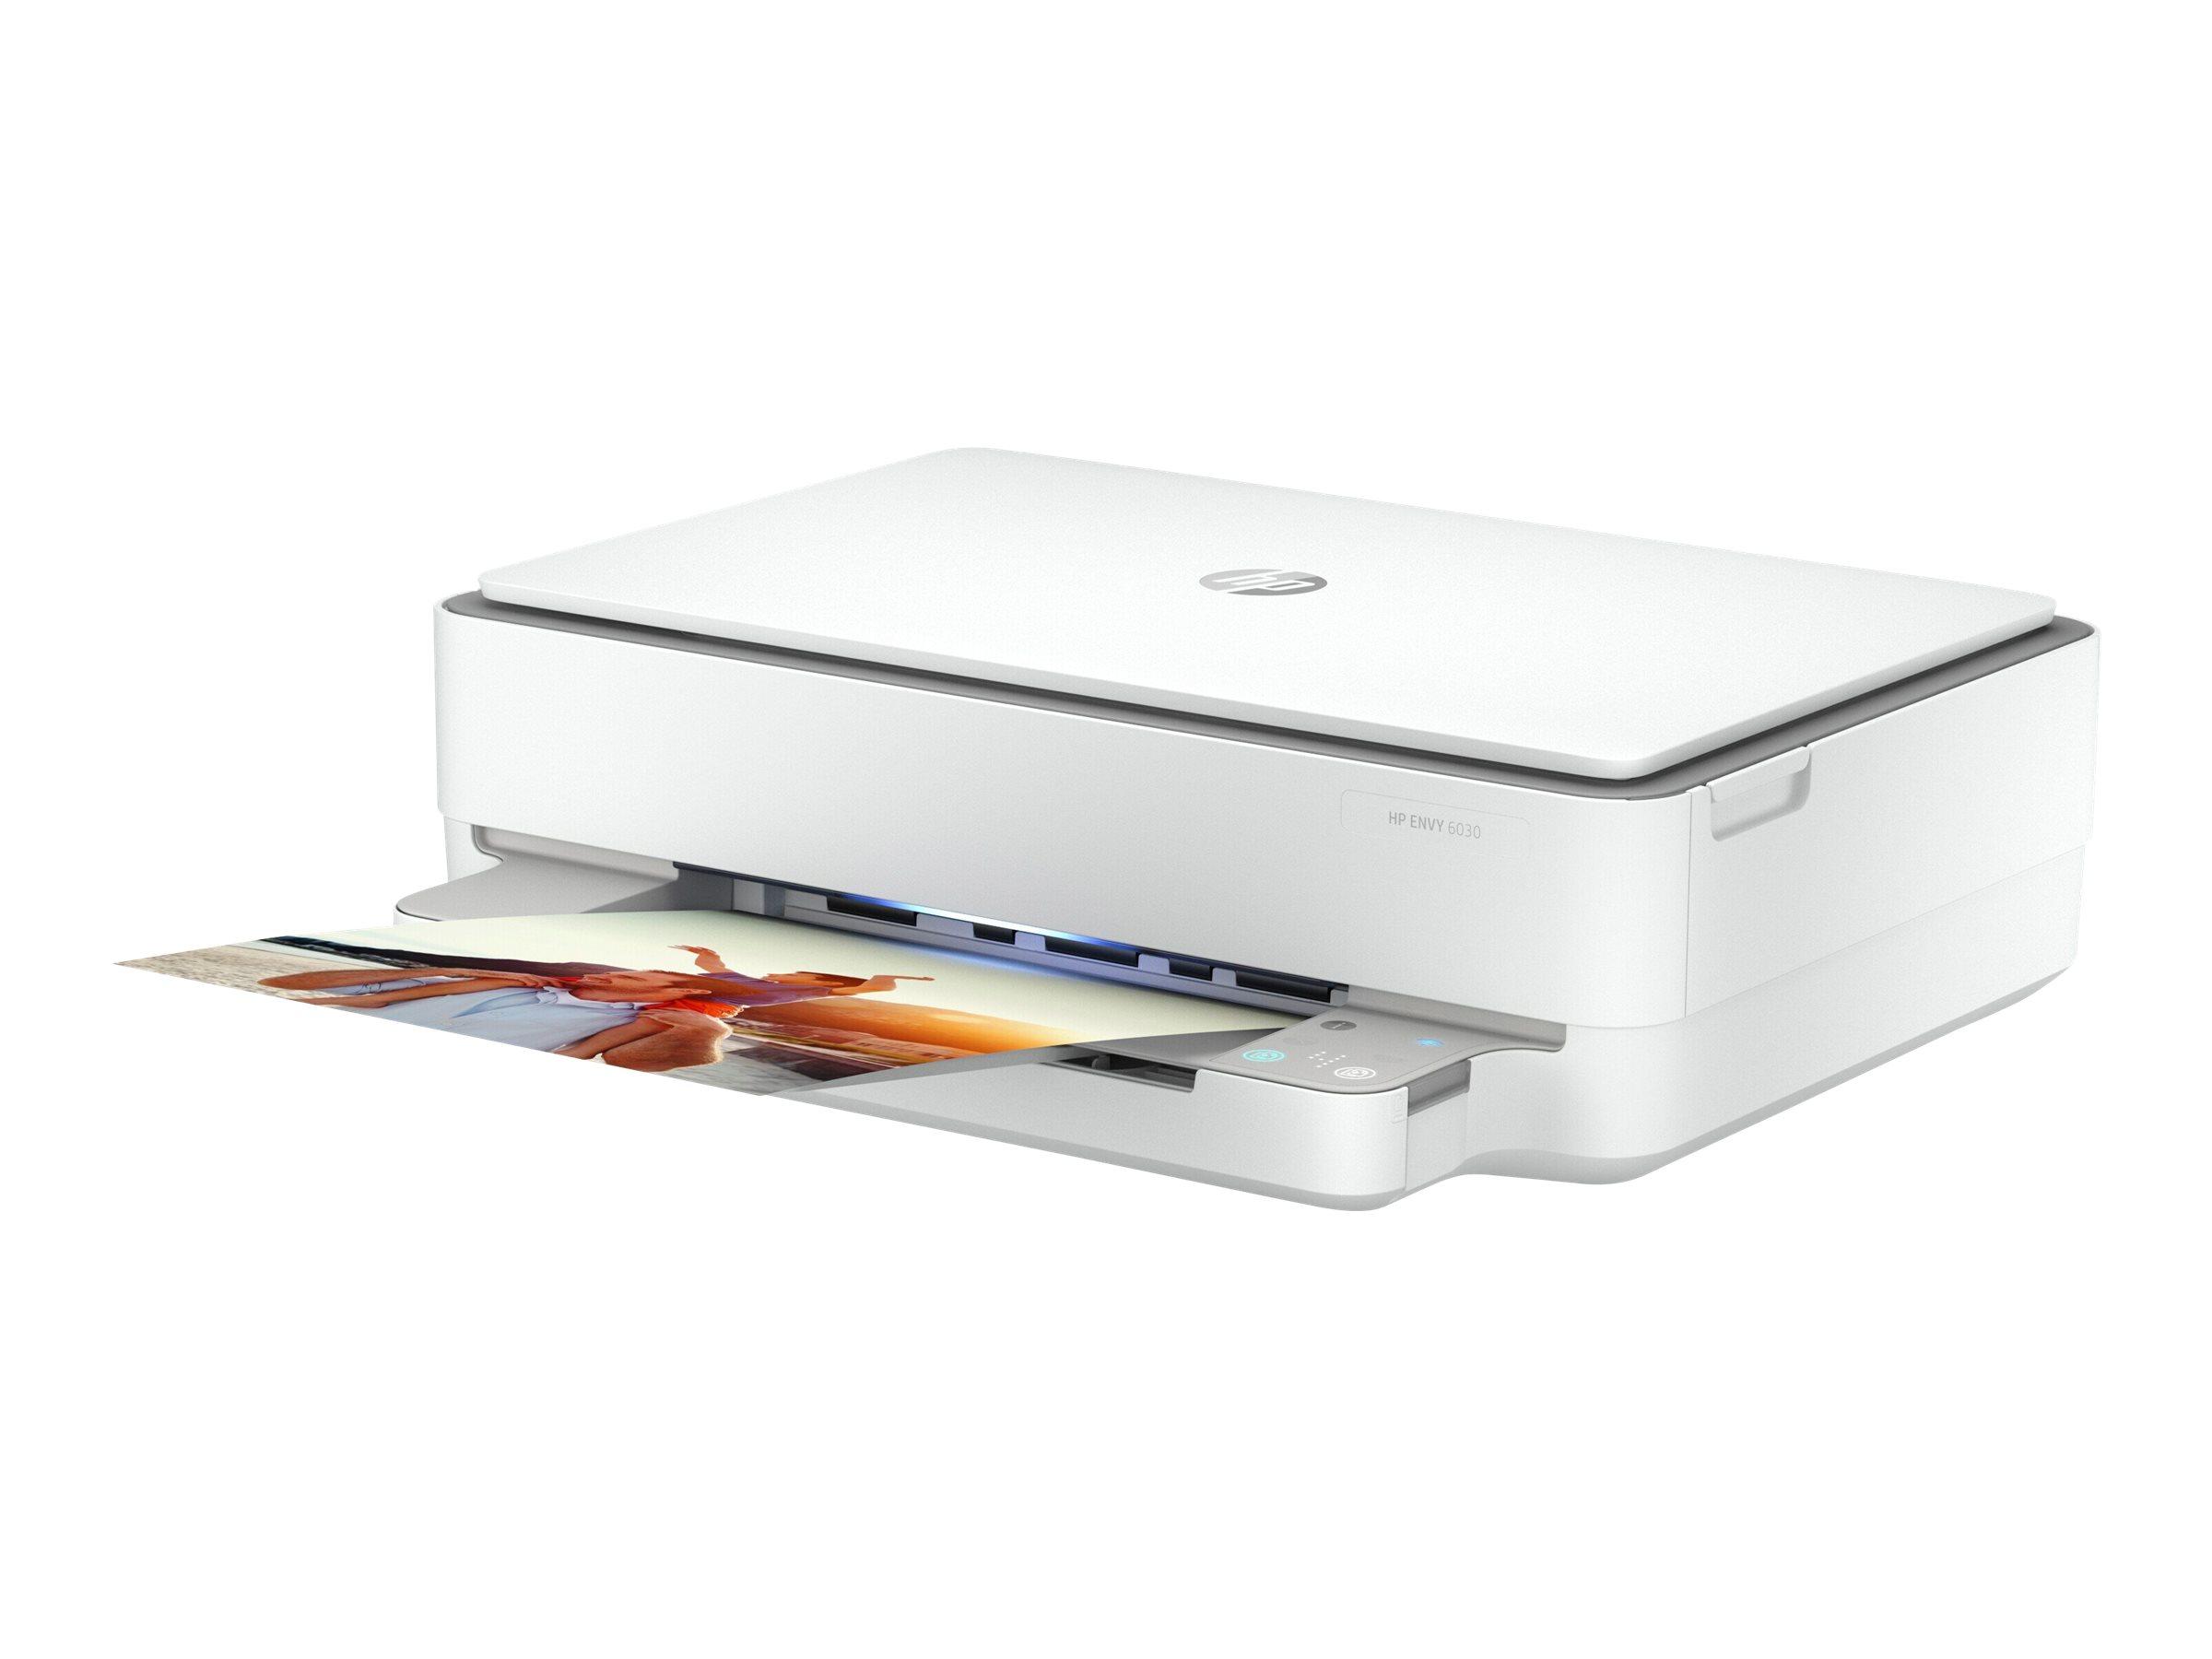 HP Envy 6030 All-In-One - Multifunktionsdrucker - Farbe - Tintenstrahl - 216 x 297 mm (Original) - A4/Letter (Medien)